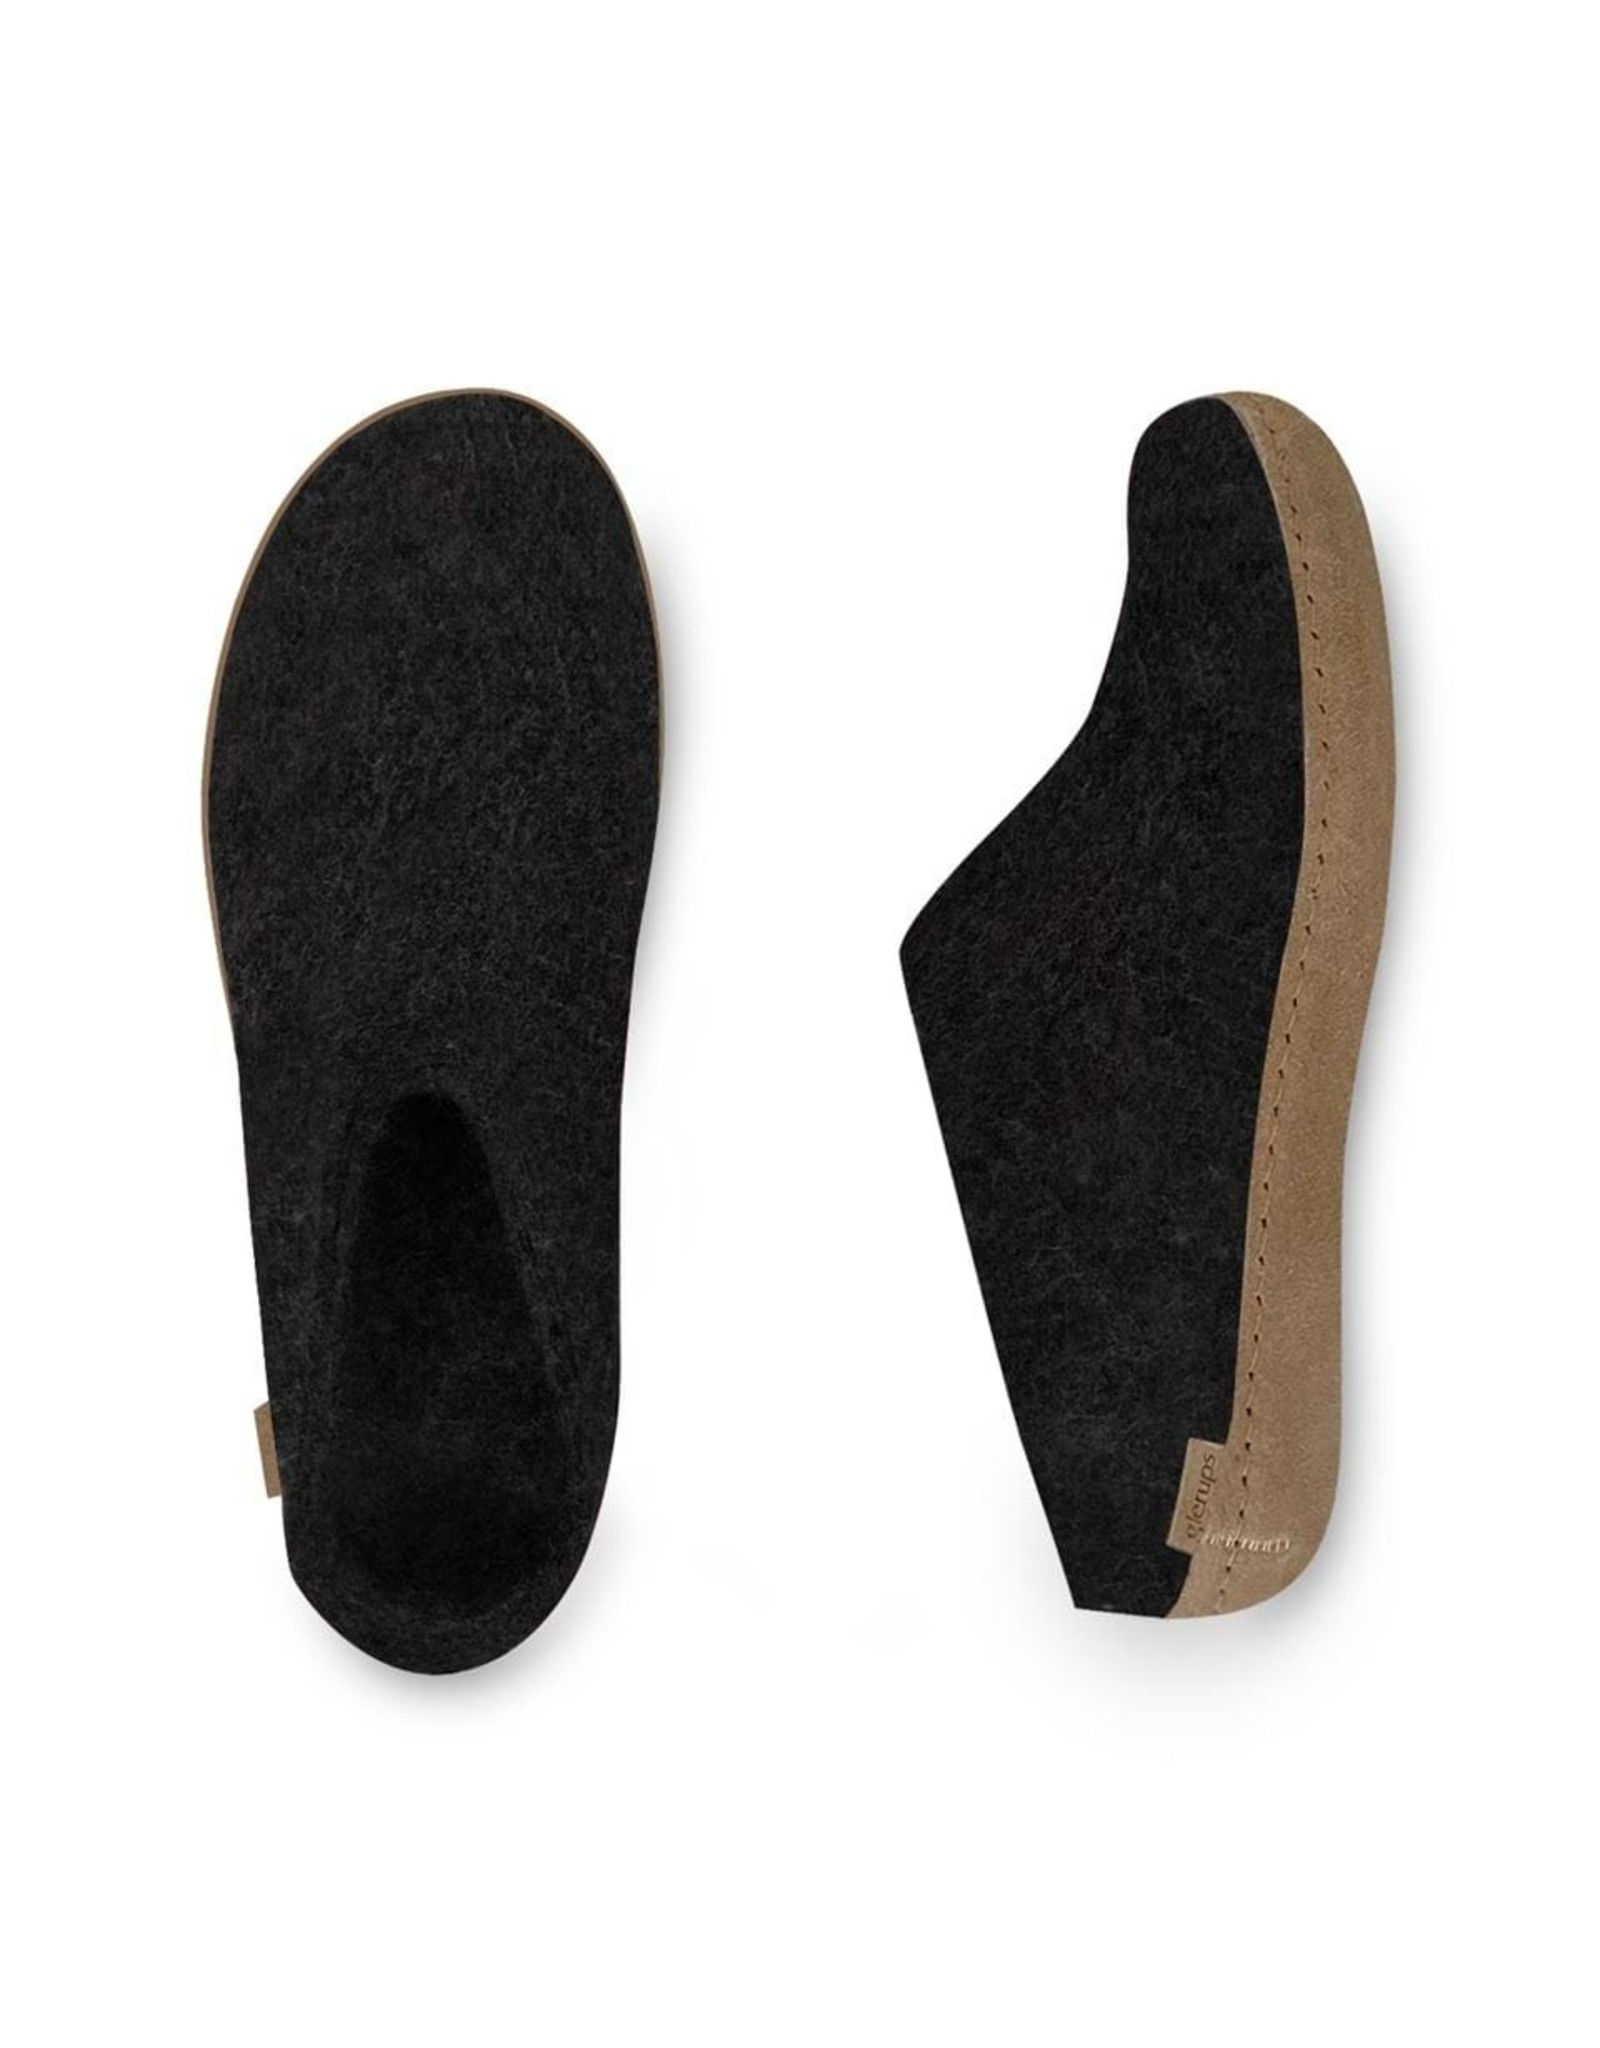 GLERUPS SLIP-ON LEATHER SOLE SLIPPER-CHARCOAL